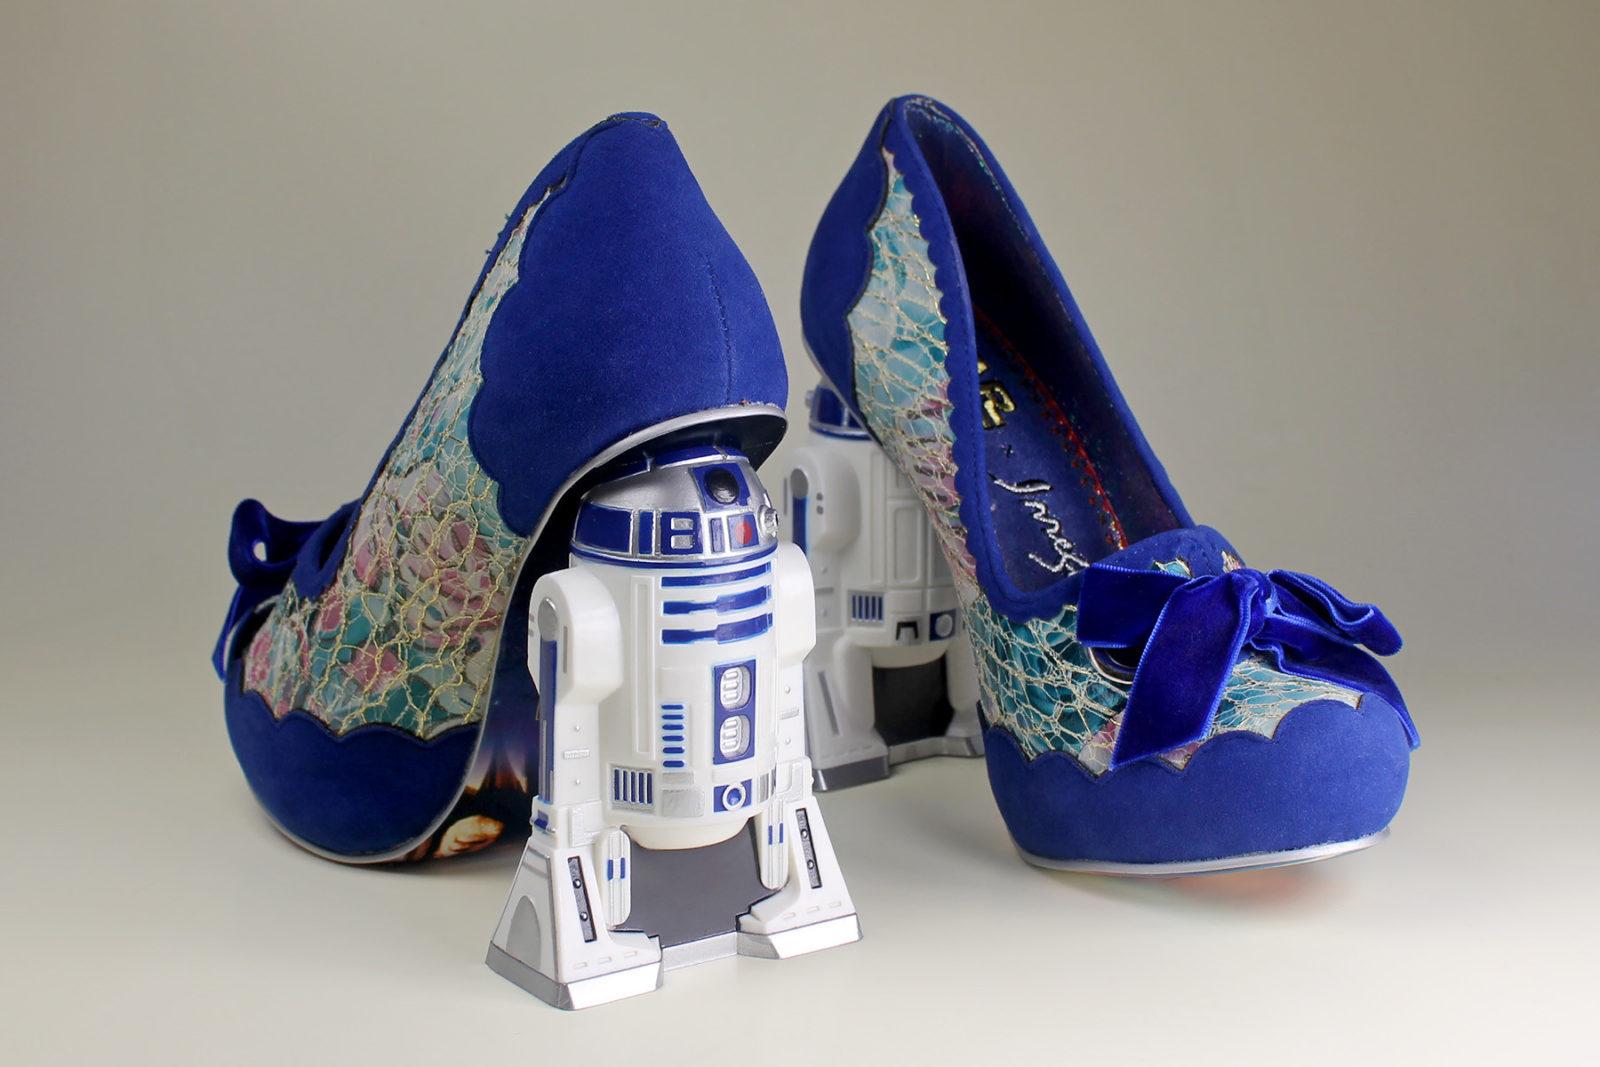 Irregular Choice x Star Wars R2-D2 heels